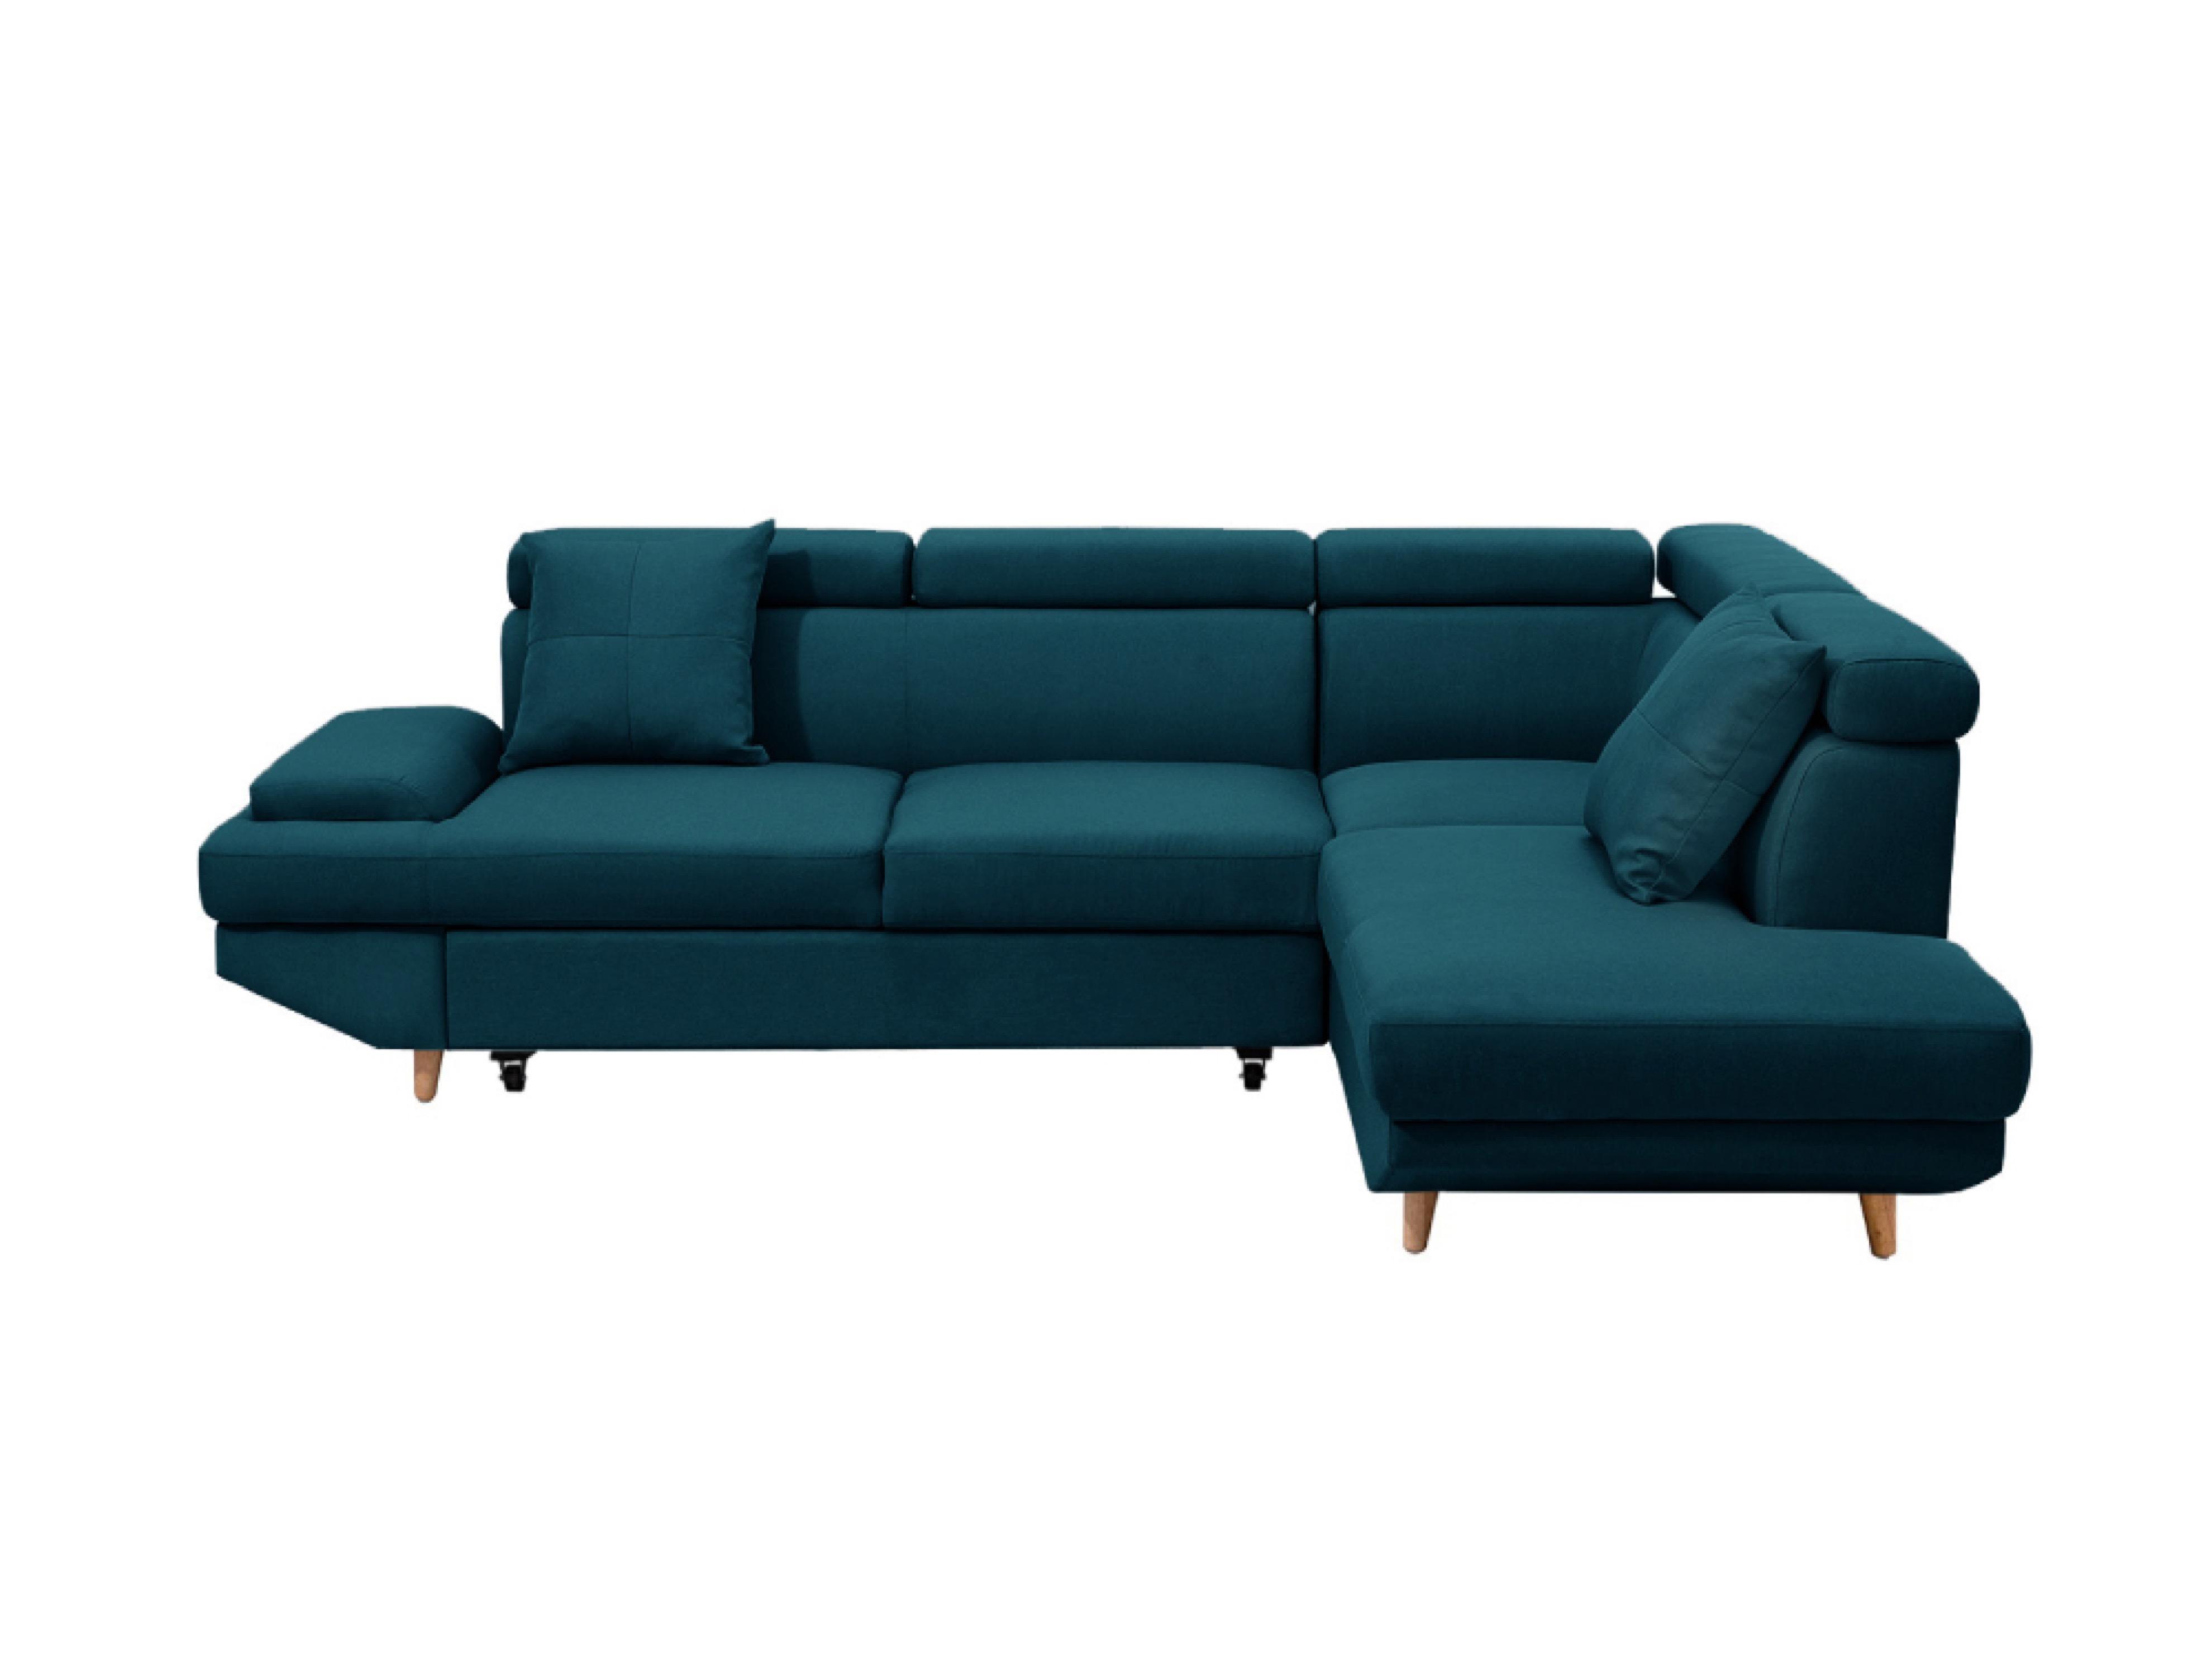 Canapé d'angle droit convertible style scandinave en tissu bleu